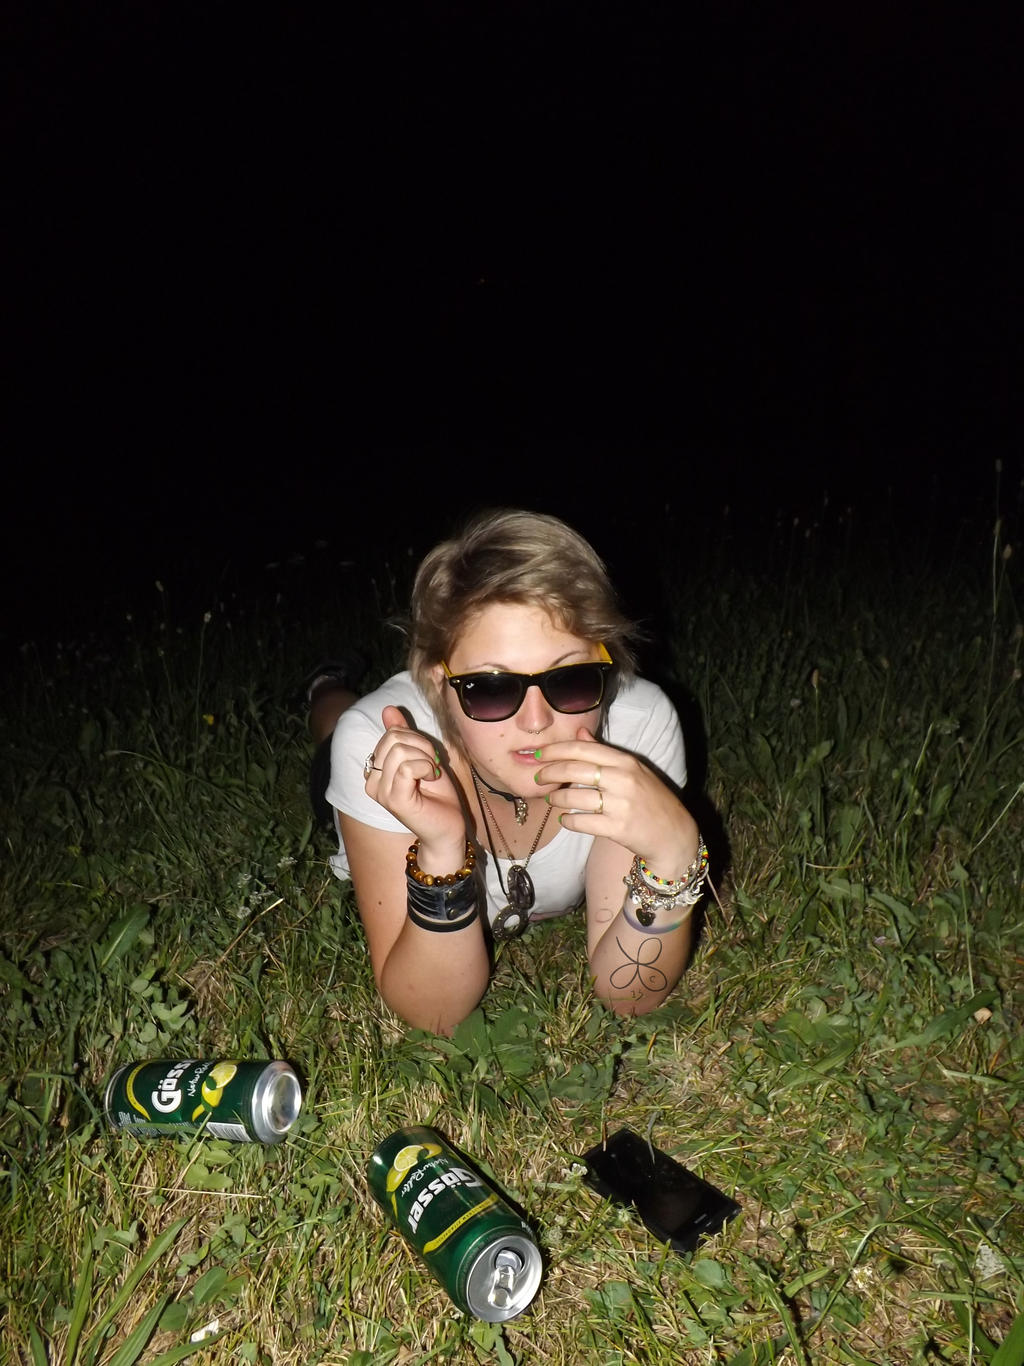 Party hard by Lynxina